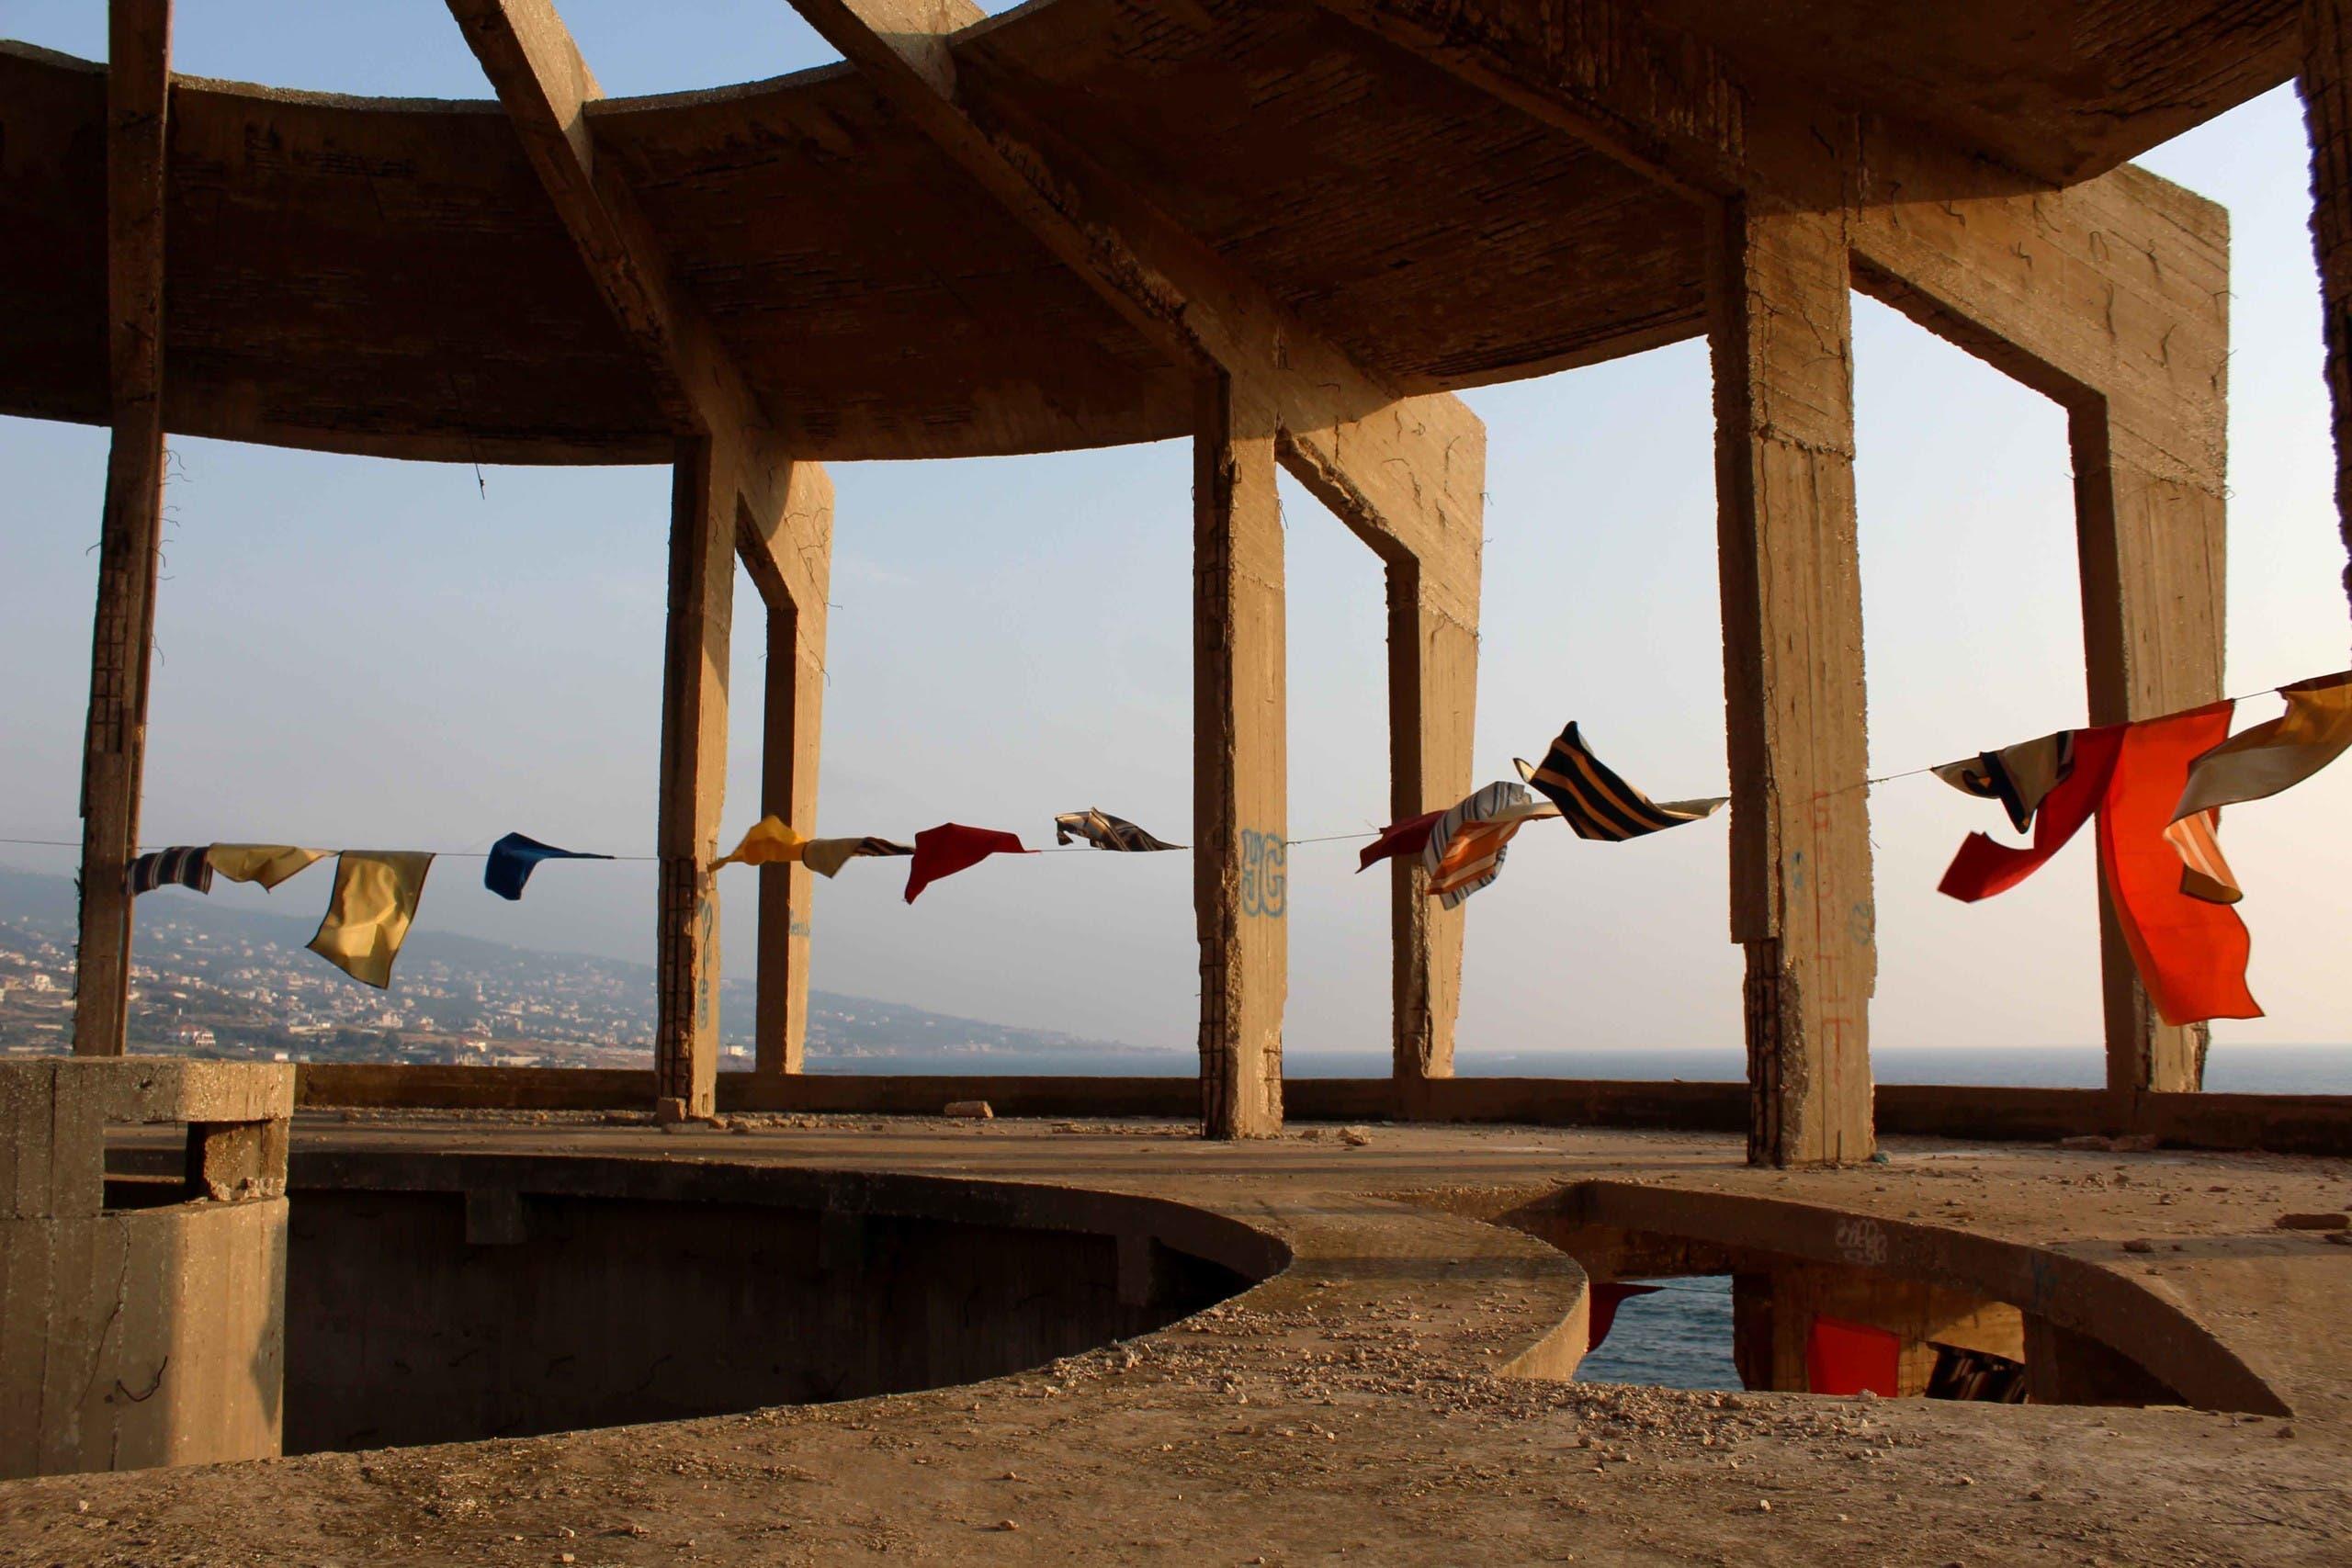 """Manchafet el Baher"" (Beach Towels) is Jad El Khoury's latest art installation in Lebanon at the abandoned aquarium in the seaside town of Batroun. (Danielle Karam)"